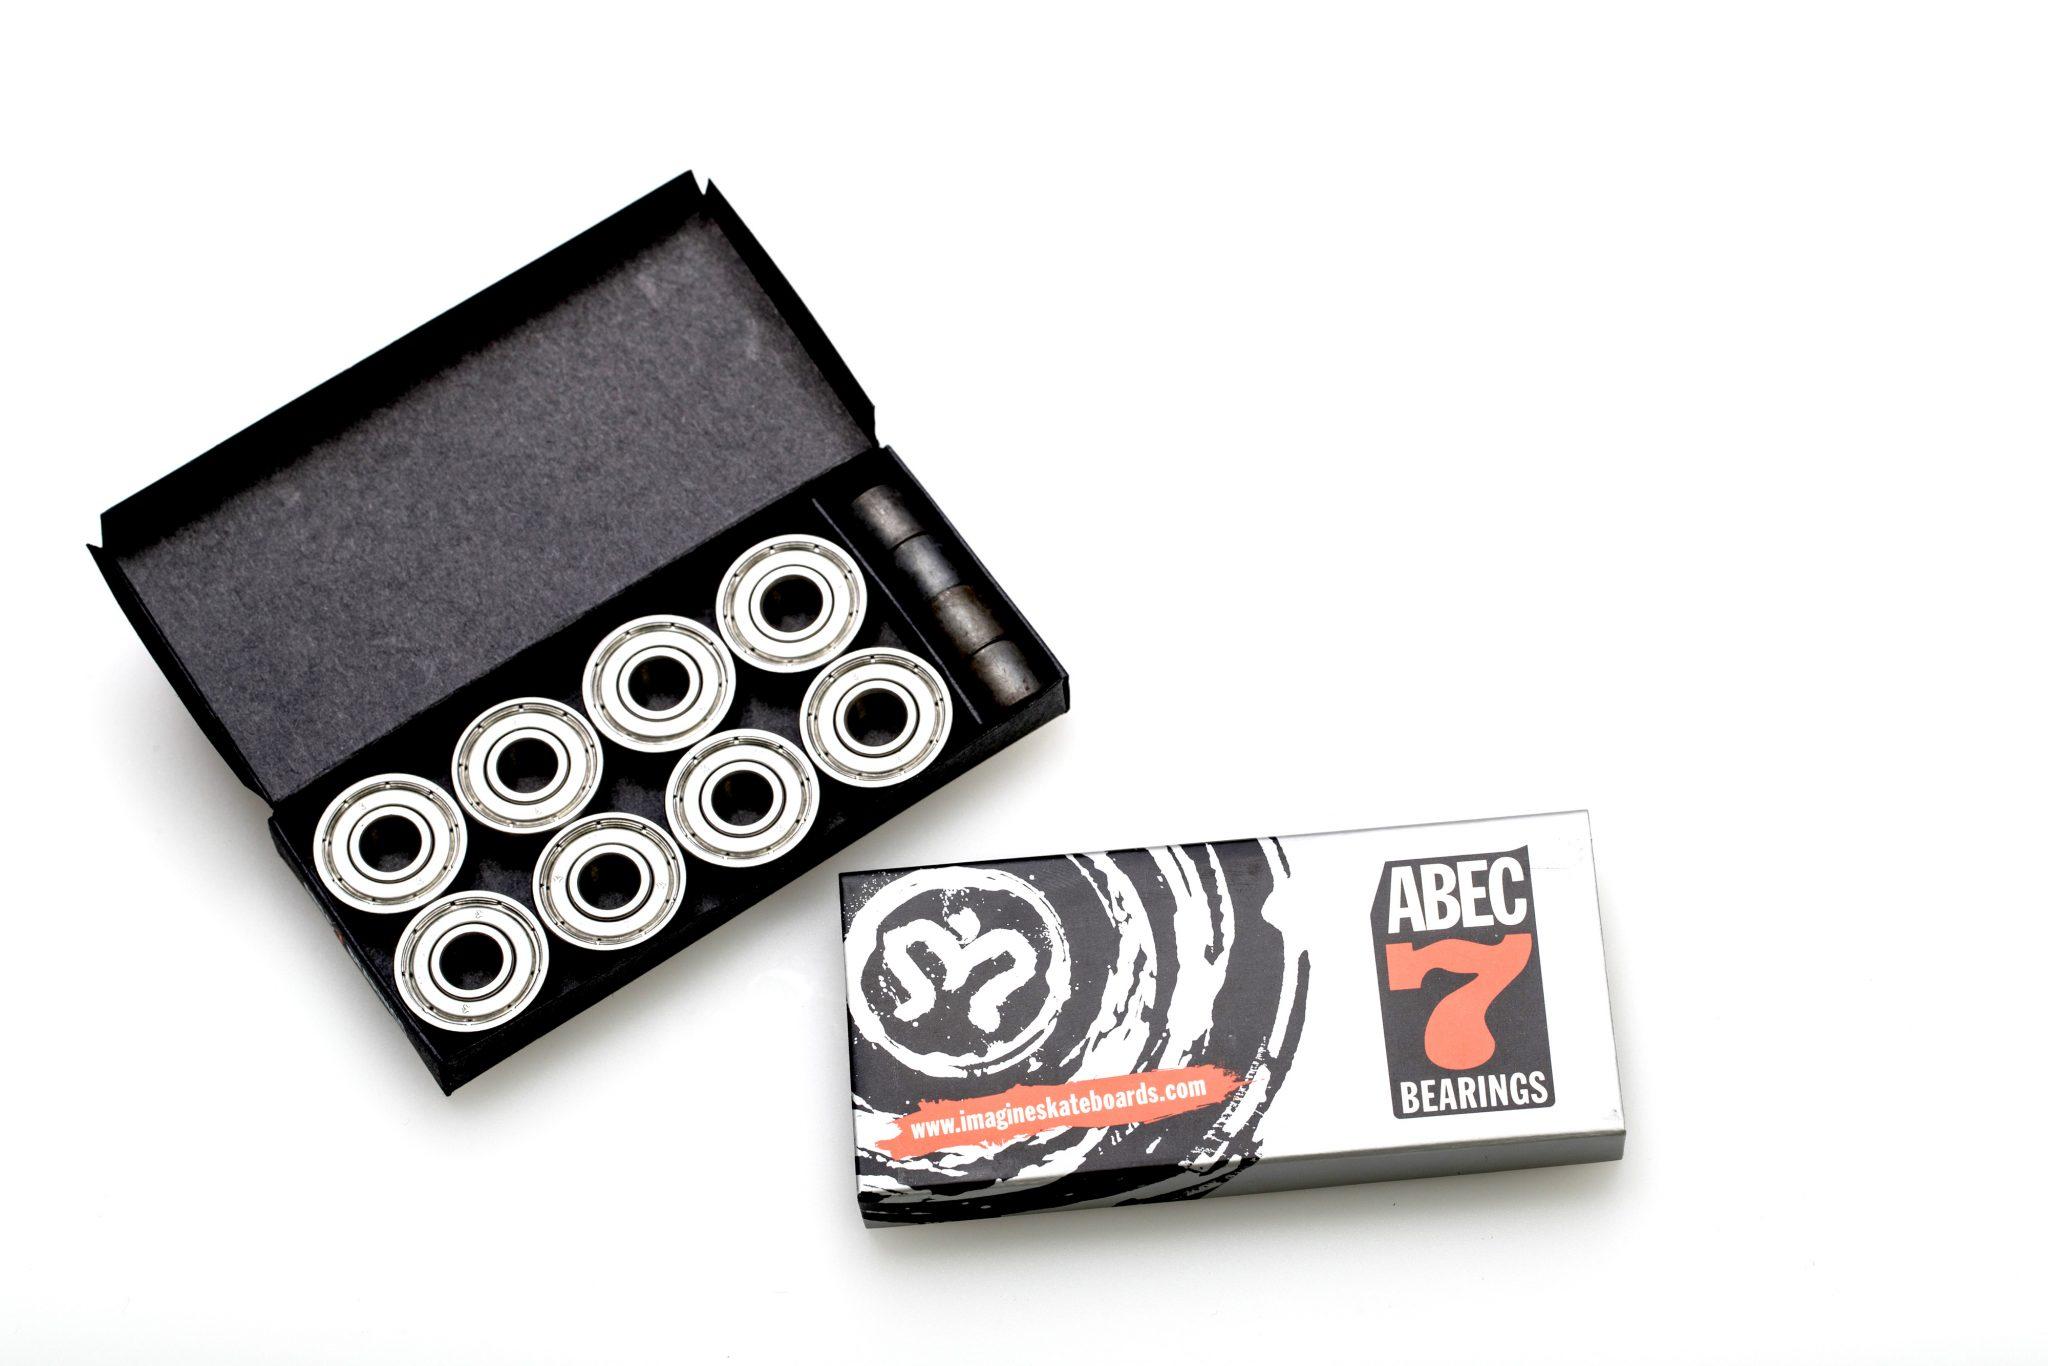 ABEC 7 STEEL Bearings - Imagine Skateboards